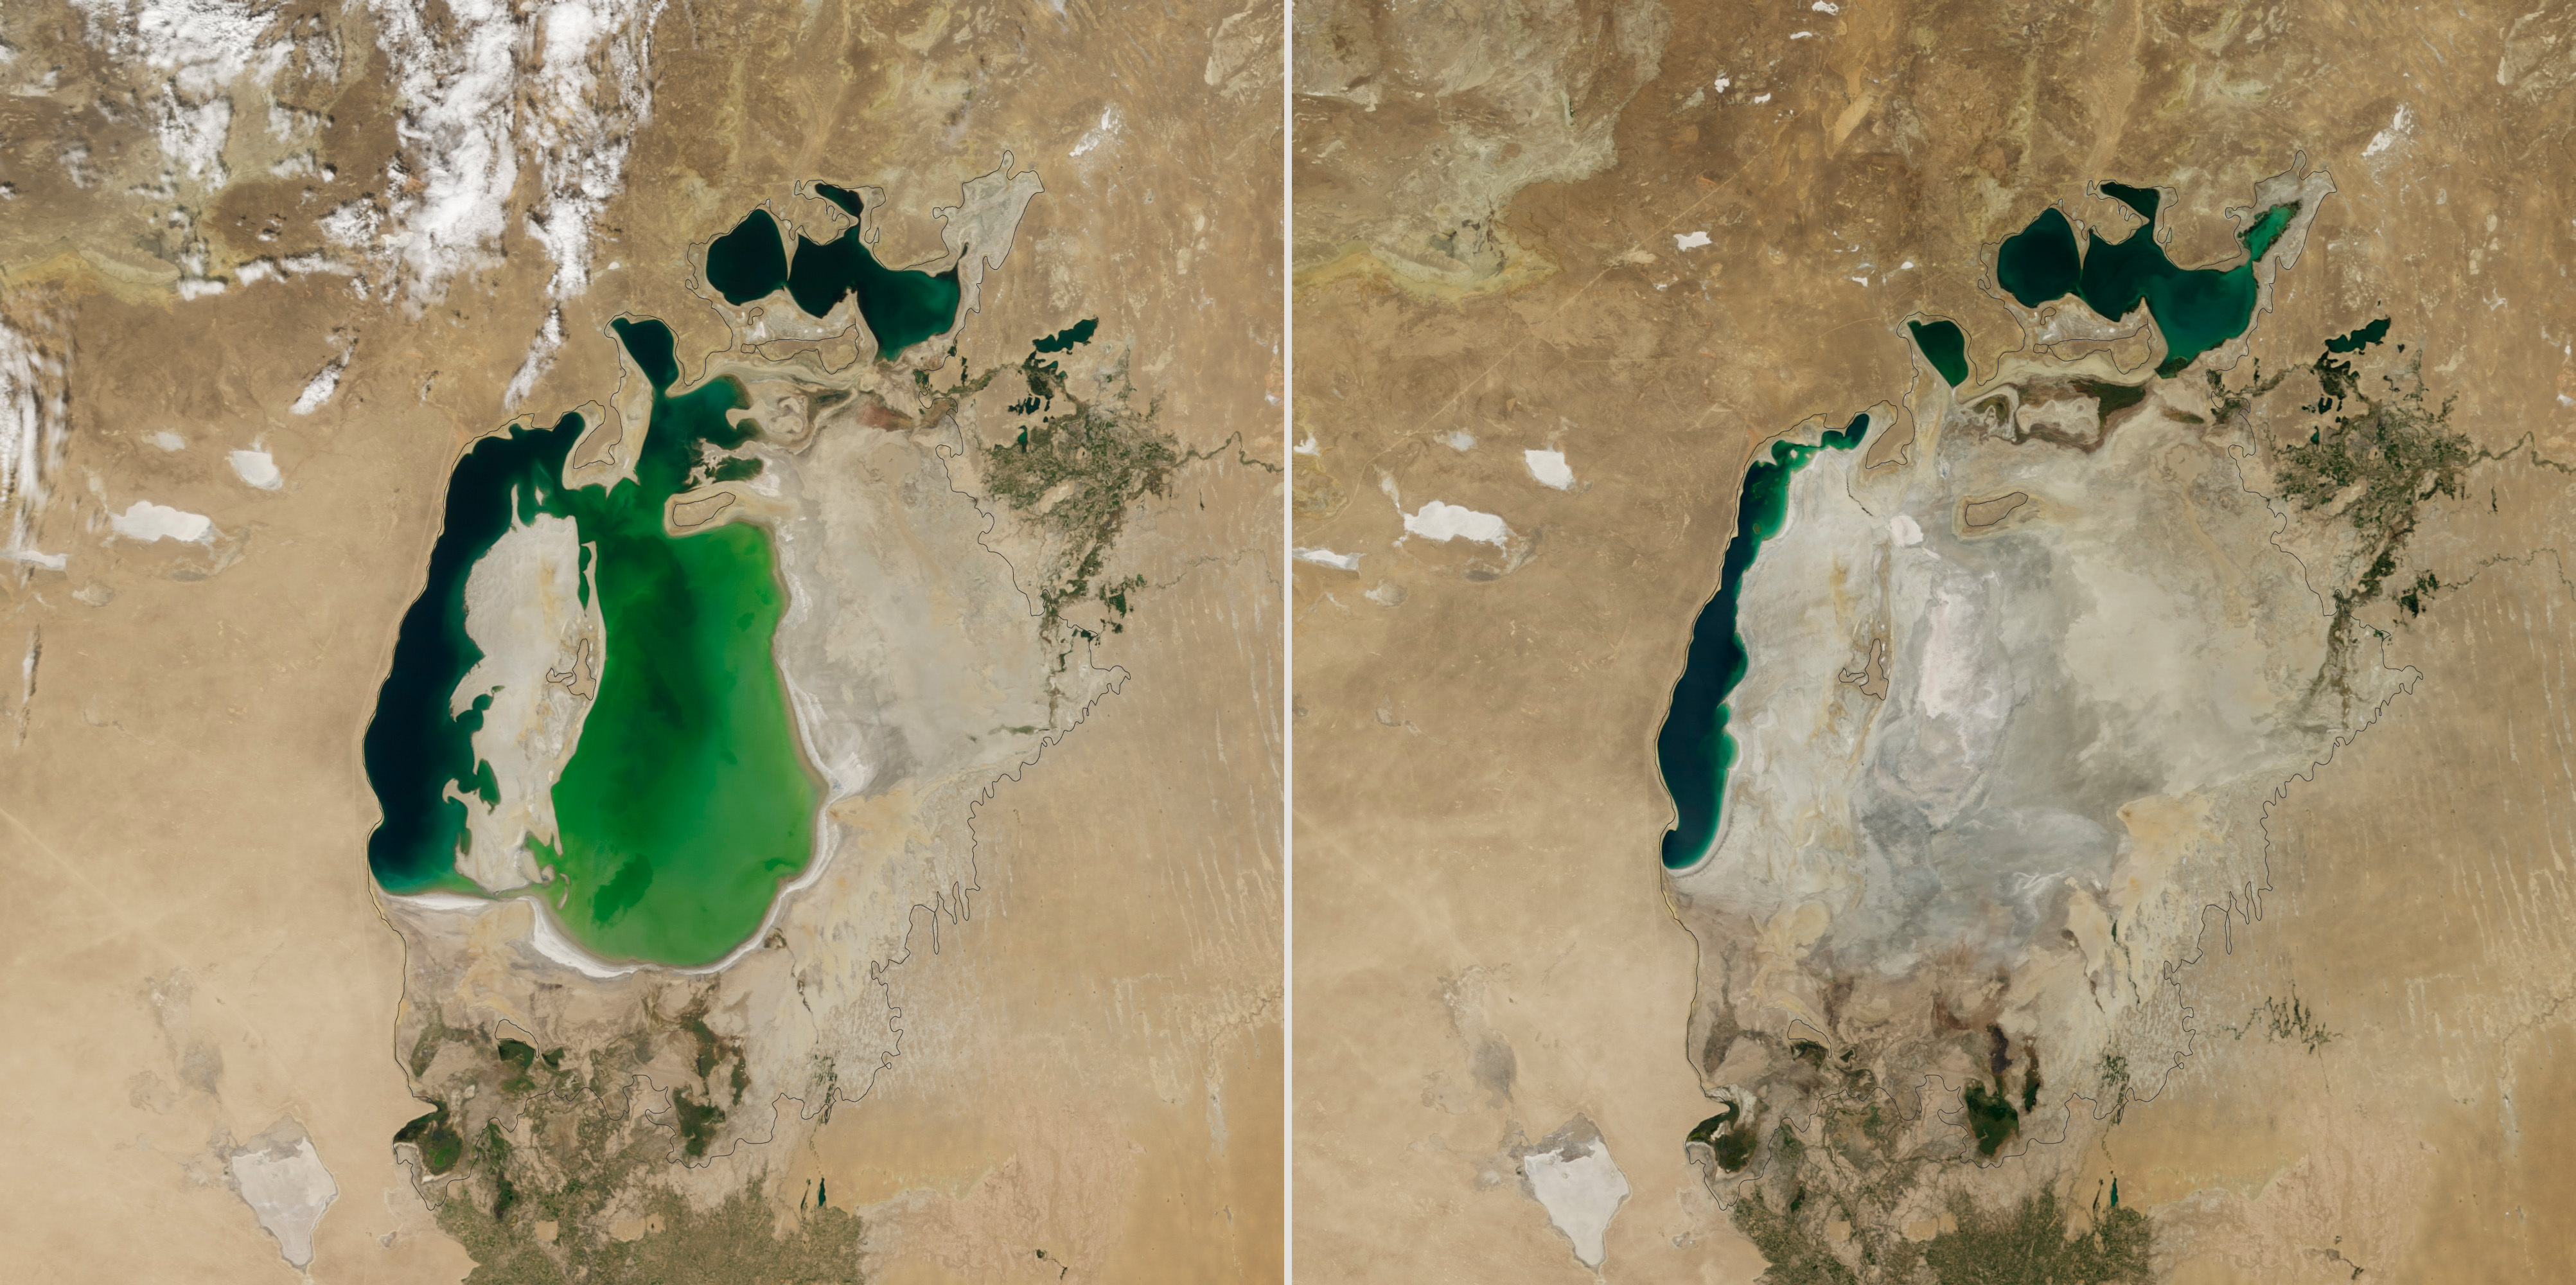 Aral Sea's Eastern Basin Has Dried Out, NASA Photos Show